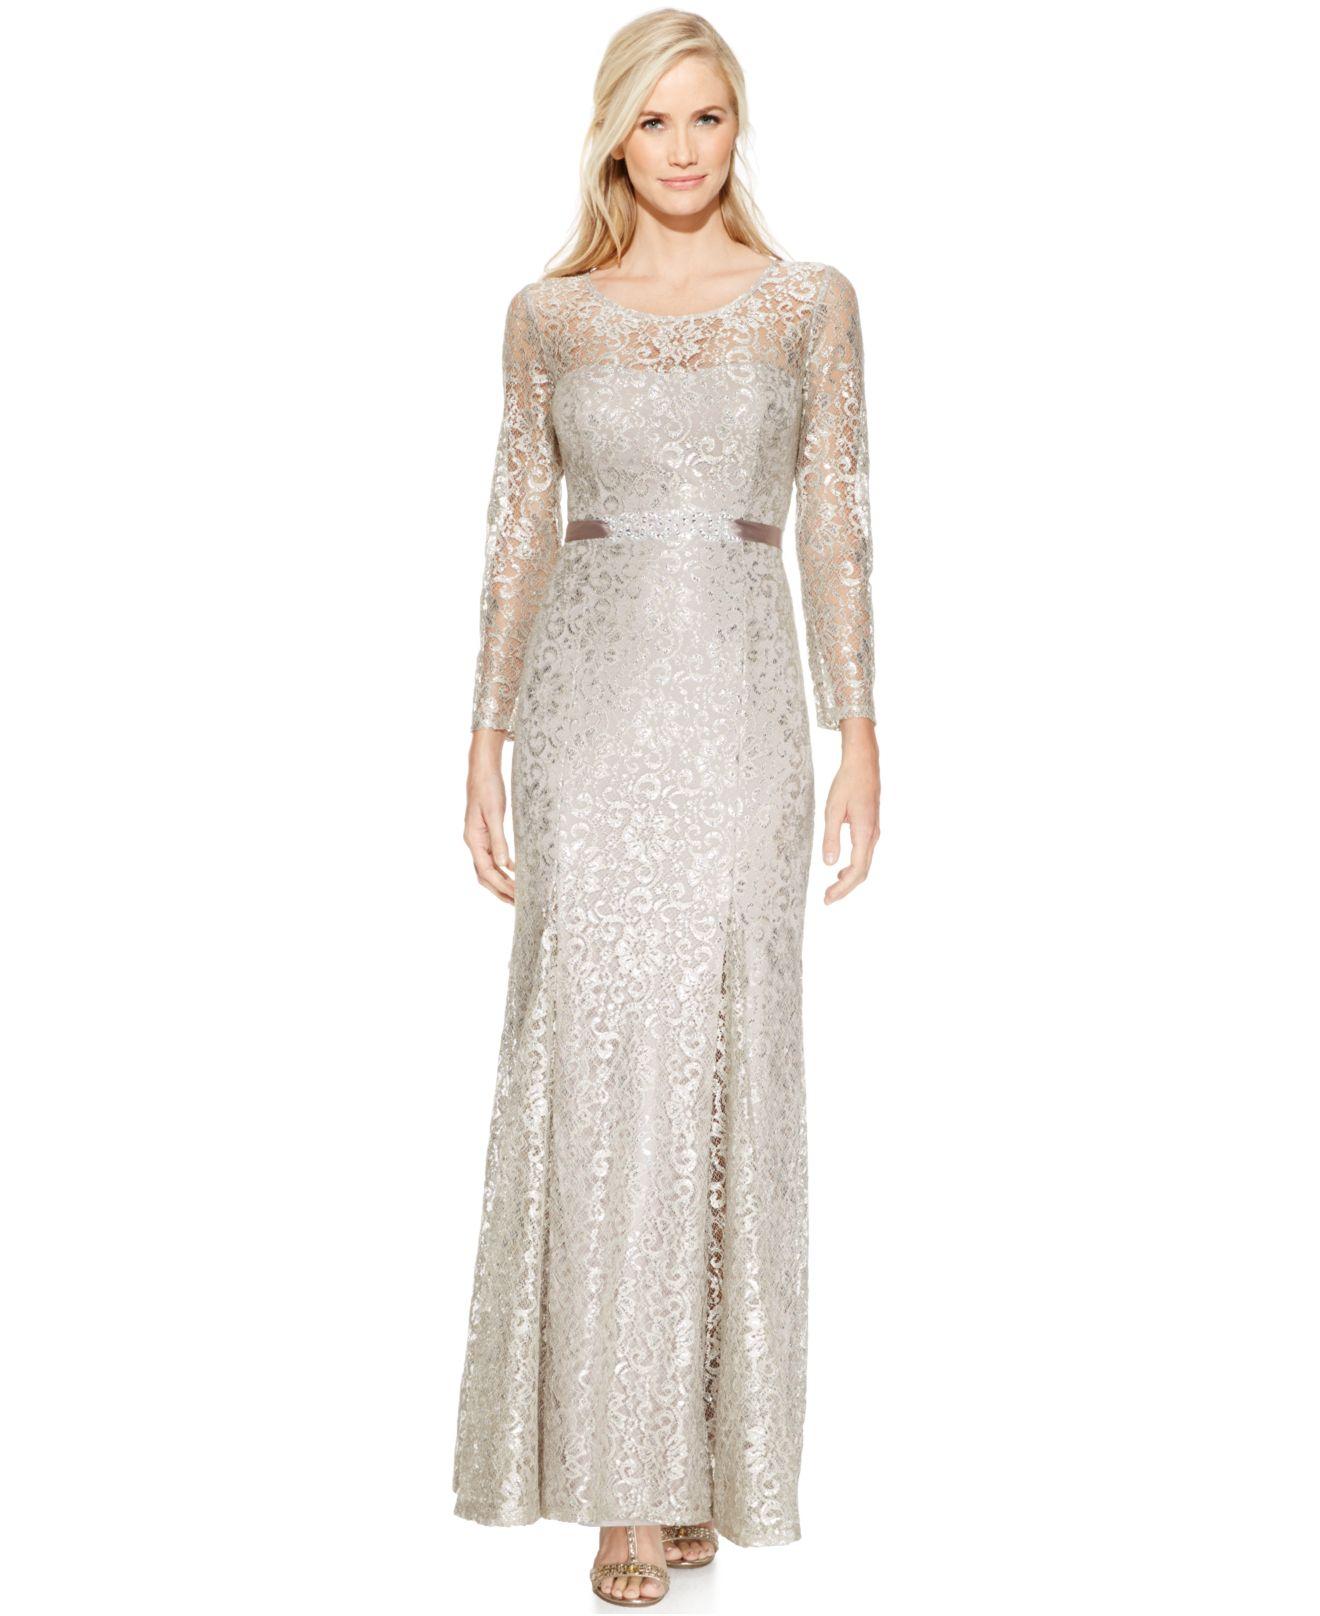 Lyst - Betsy & Adam Long-sleeve Open-back Lace Gown in Metallic